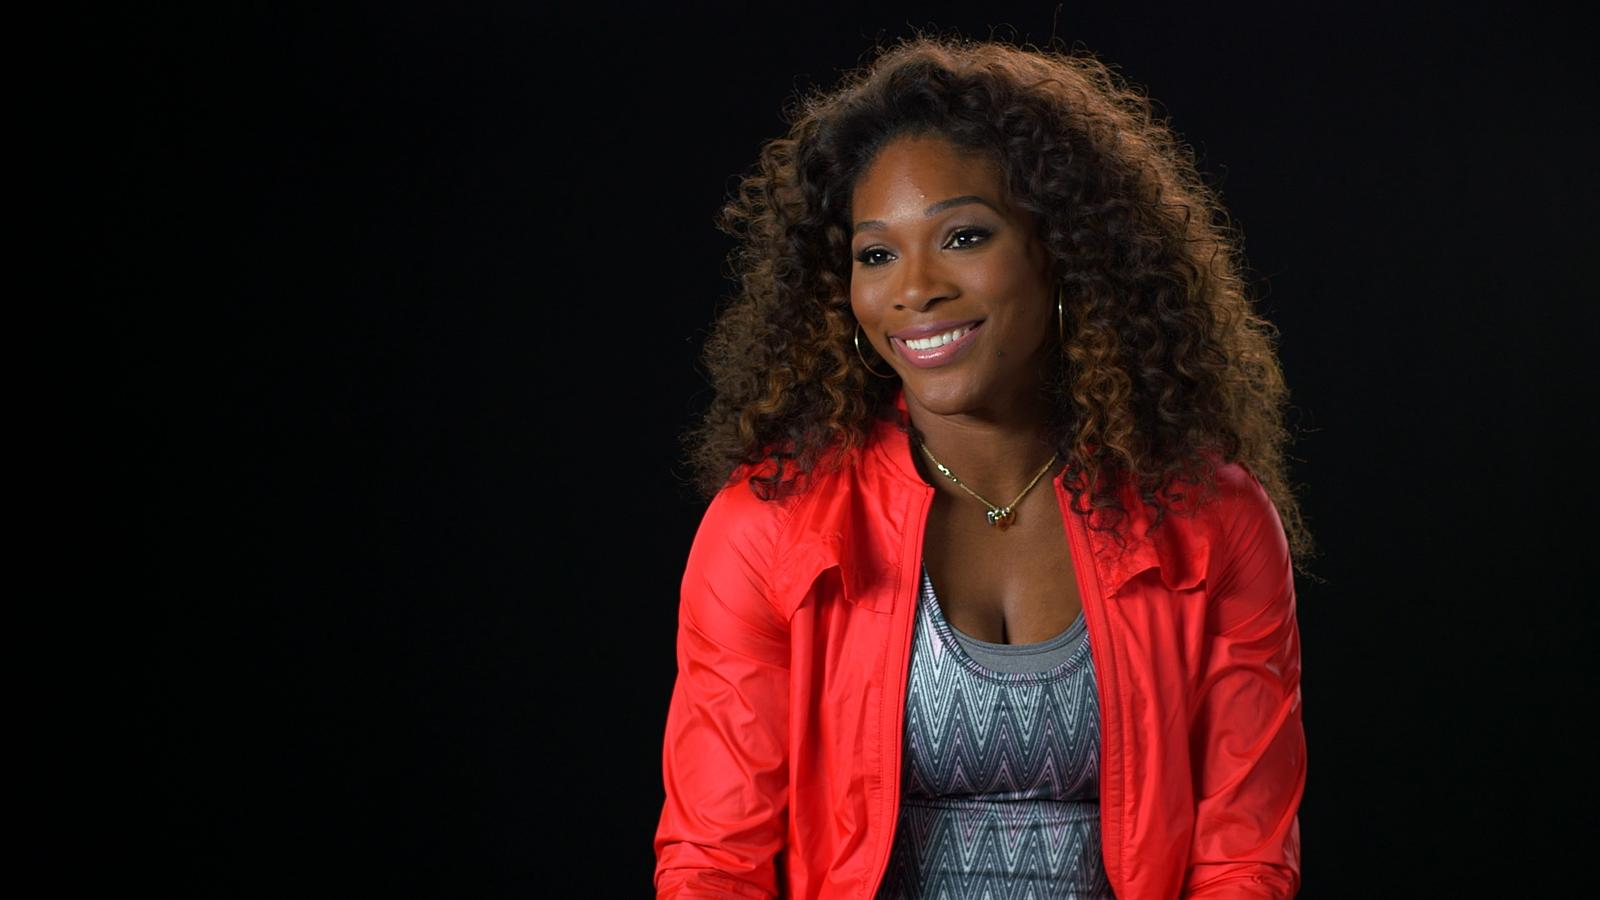 Serena Williams for Let's Move! Active Schools PSA